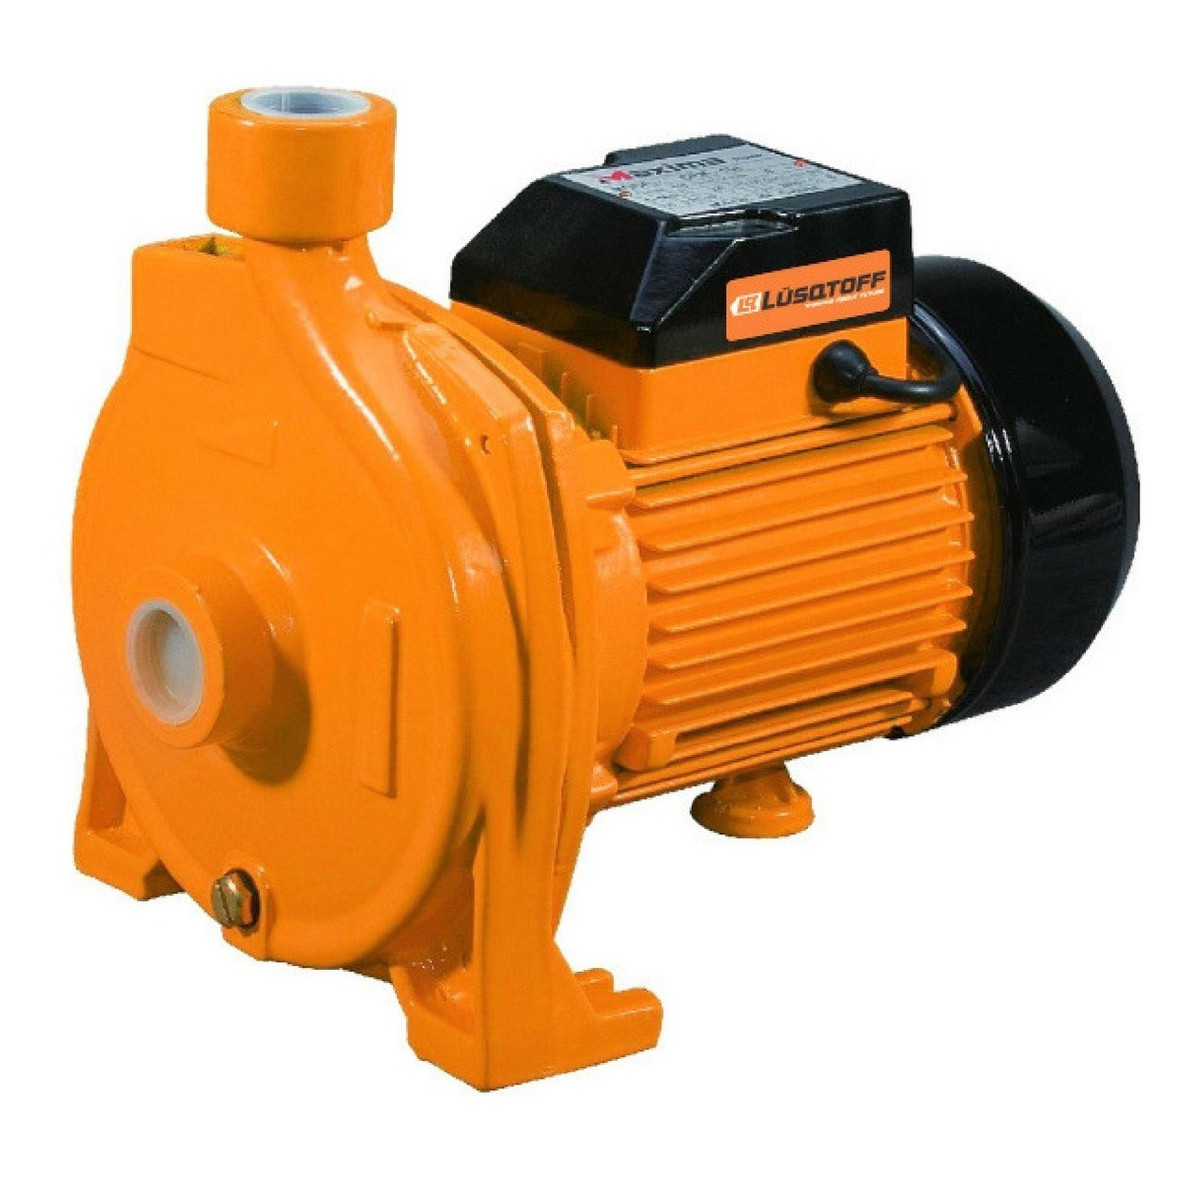 Bomba Centrifuga De Agua Lusqtoff Cpm158